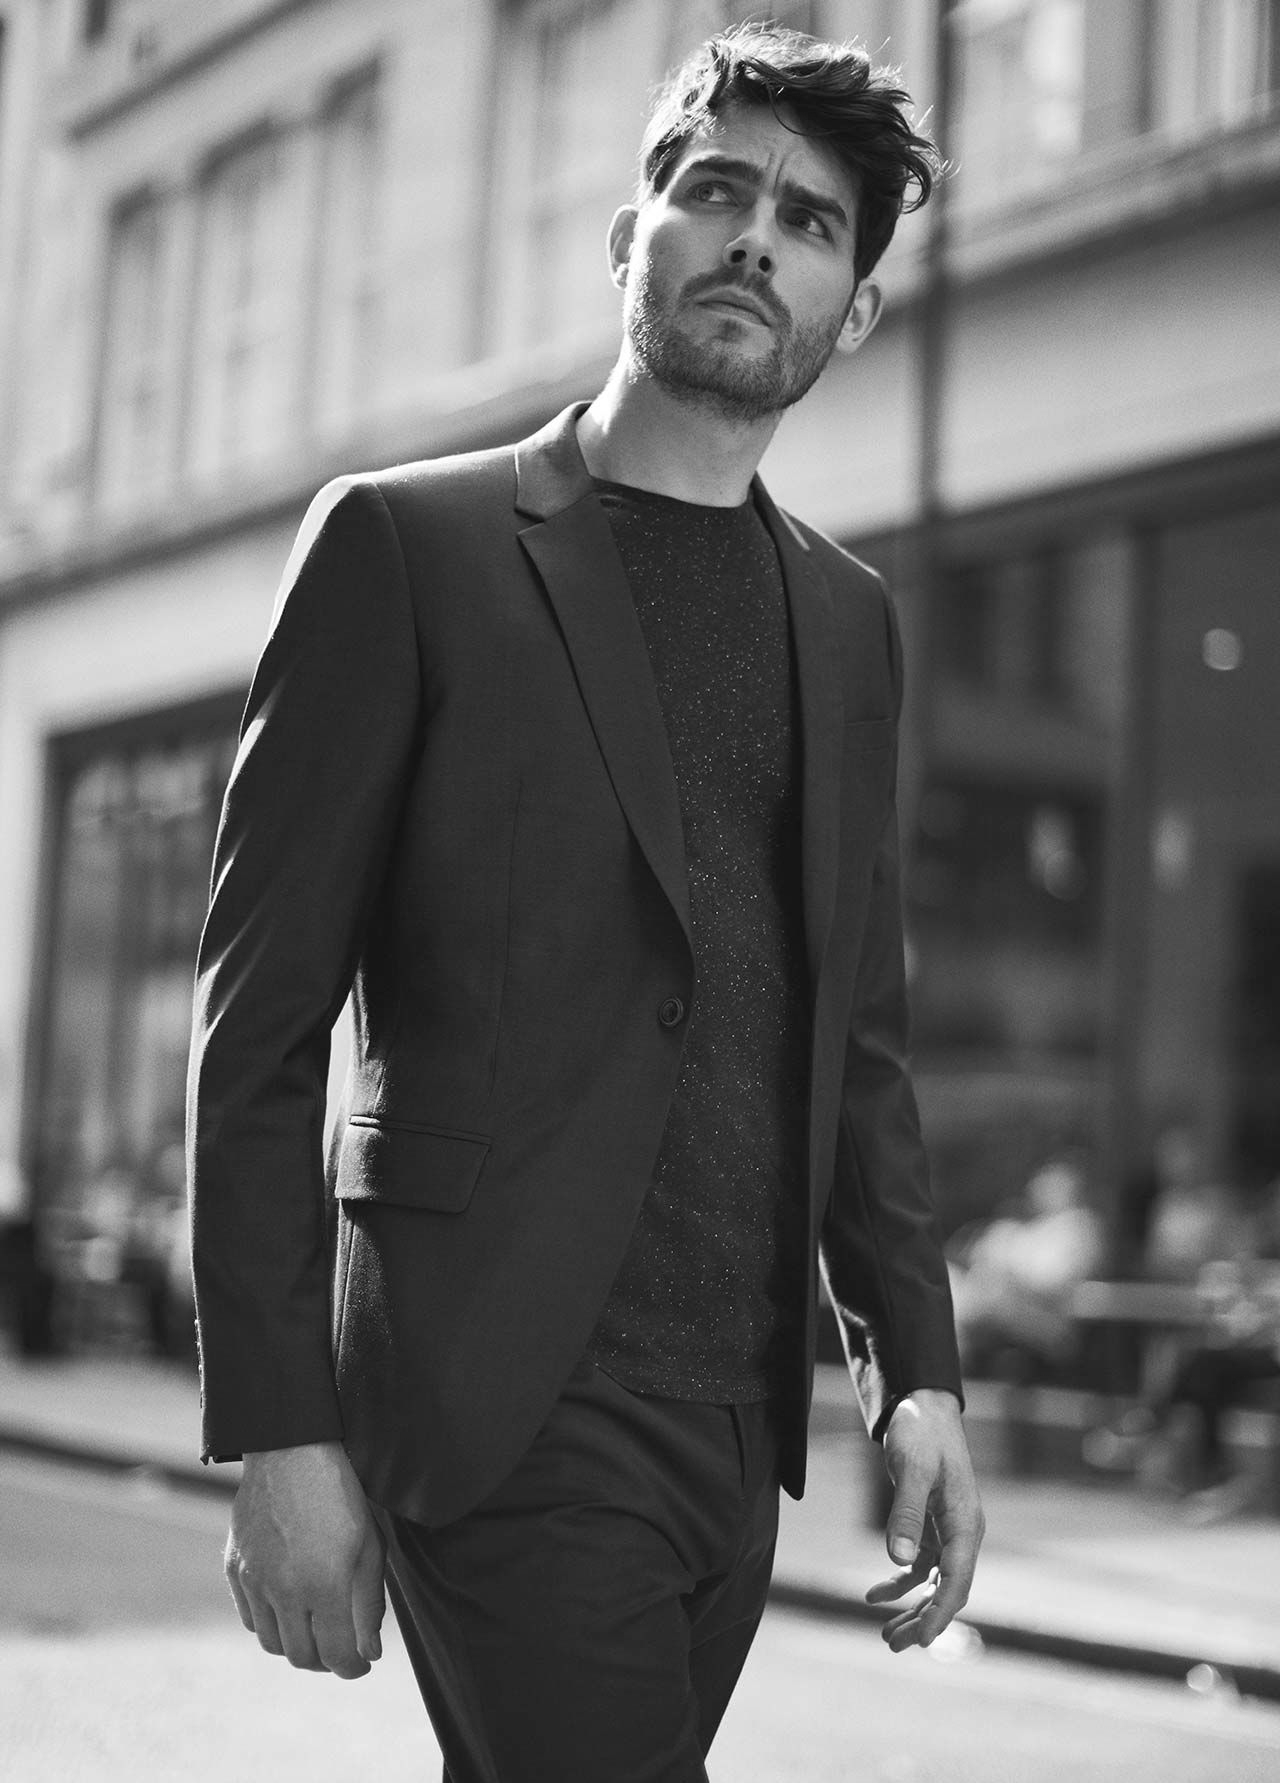 Winks slim-fit wool blazer , £275  Nate flecked crew-neck t-shirt , £35  Winks slim-fit wool trousers , £125